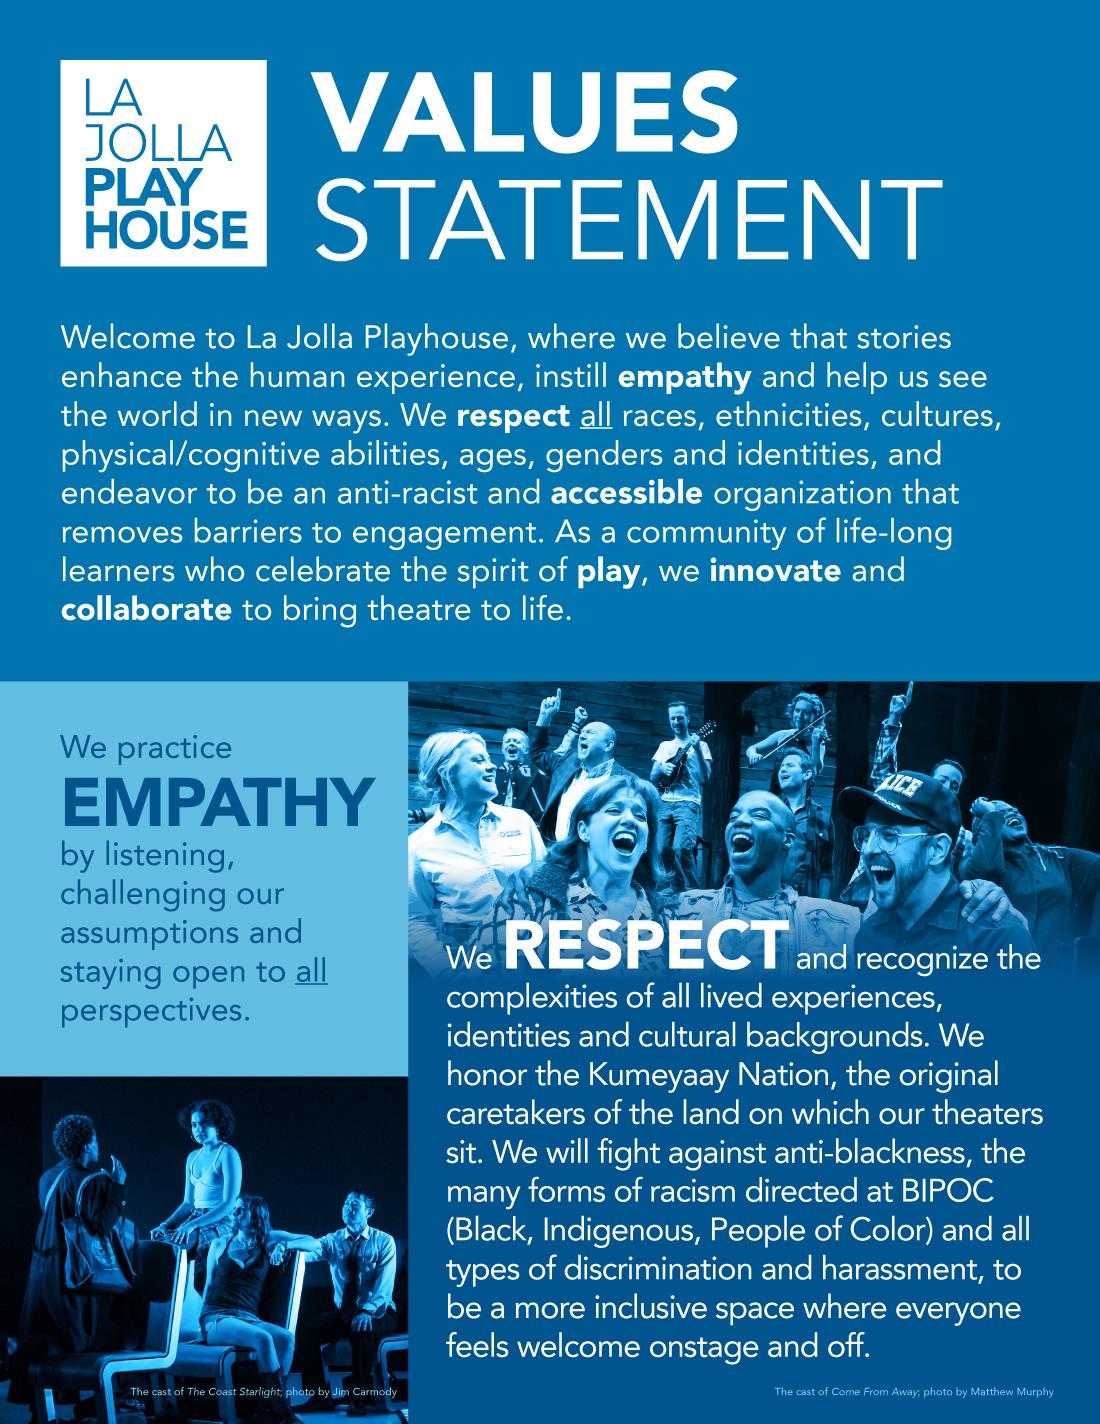 La Jolla Playhouse Values Statement page 1